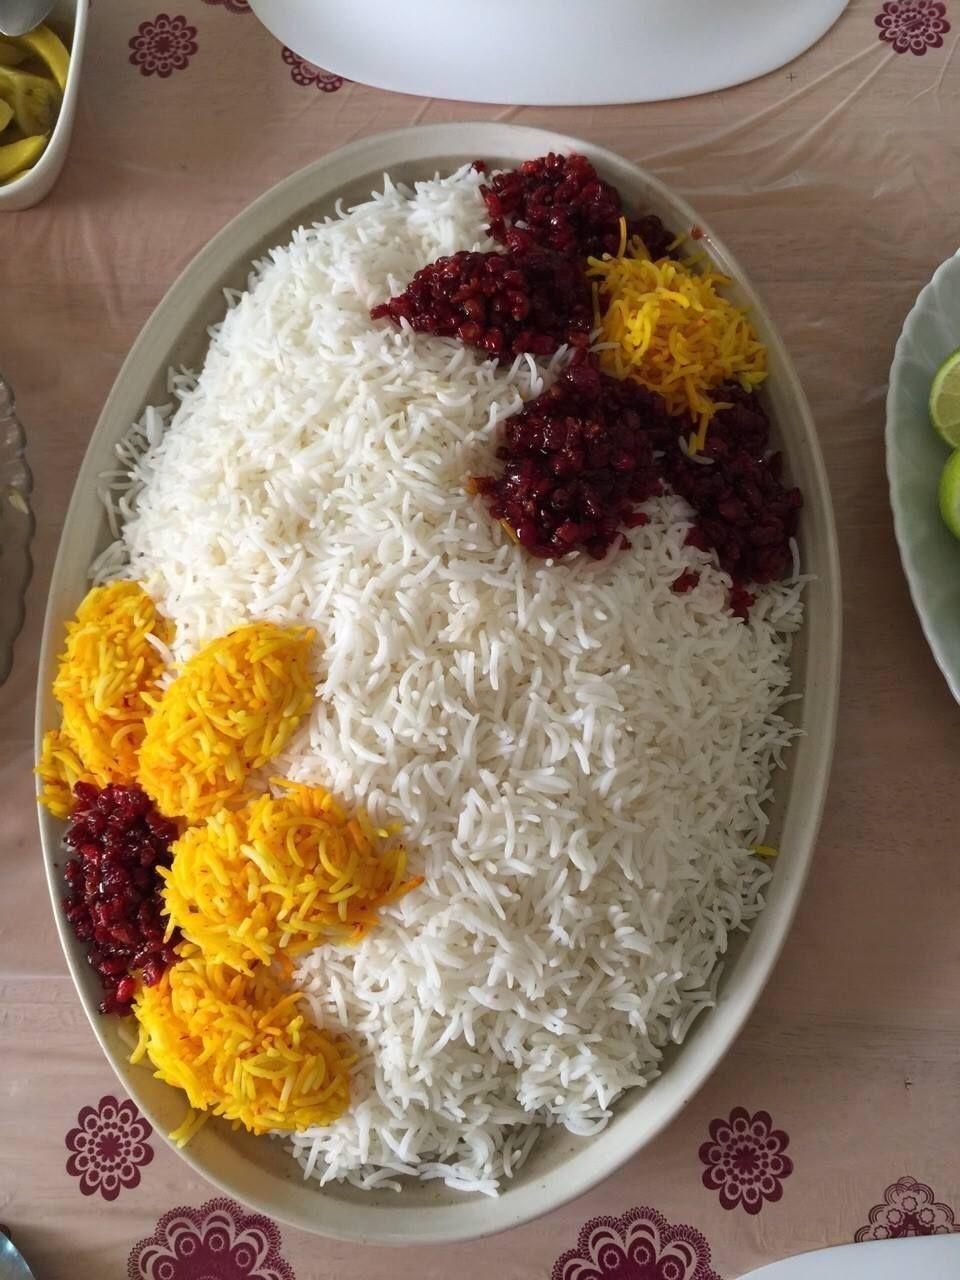 Saffron Rice With Berries